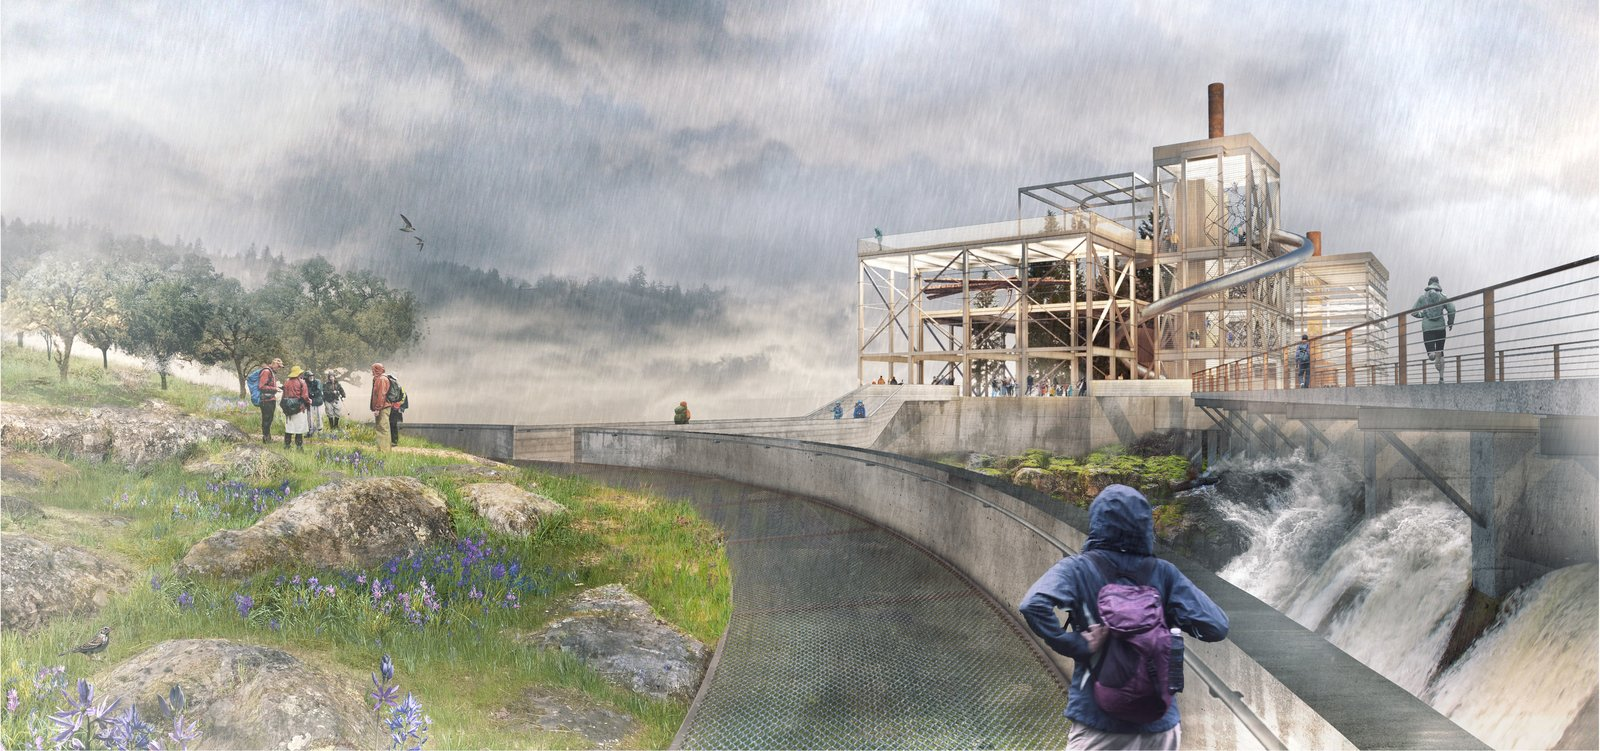 Photo 1 of 8 in Snøhetta Designs a New Riverwalk That Will Bring Public Access to Oregon City's Willamette Falls